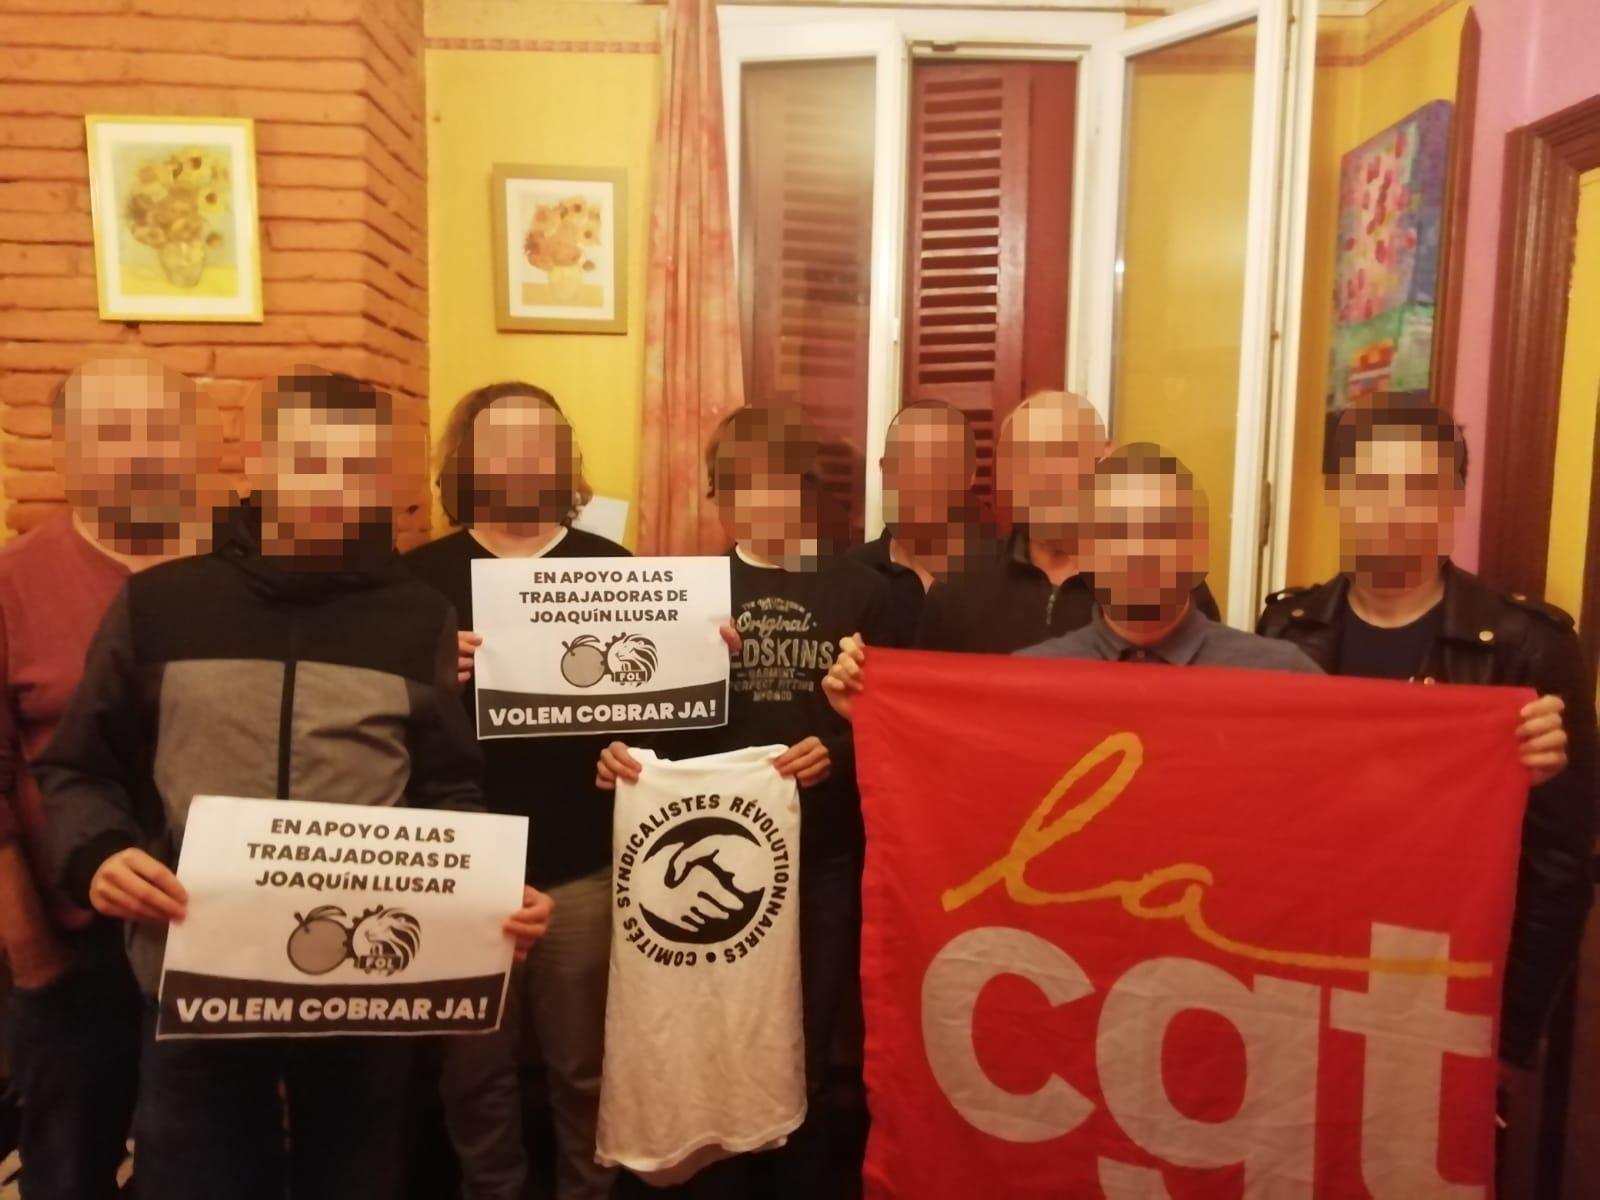 Apoyo Desde Francia A Trabajadores De Joaquin Llusar